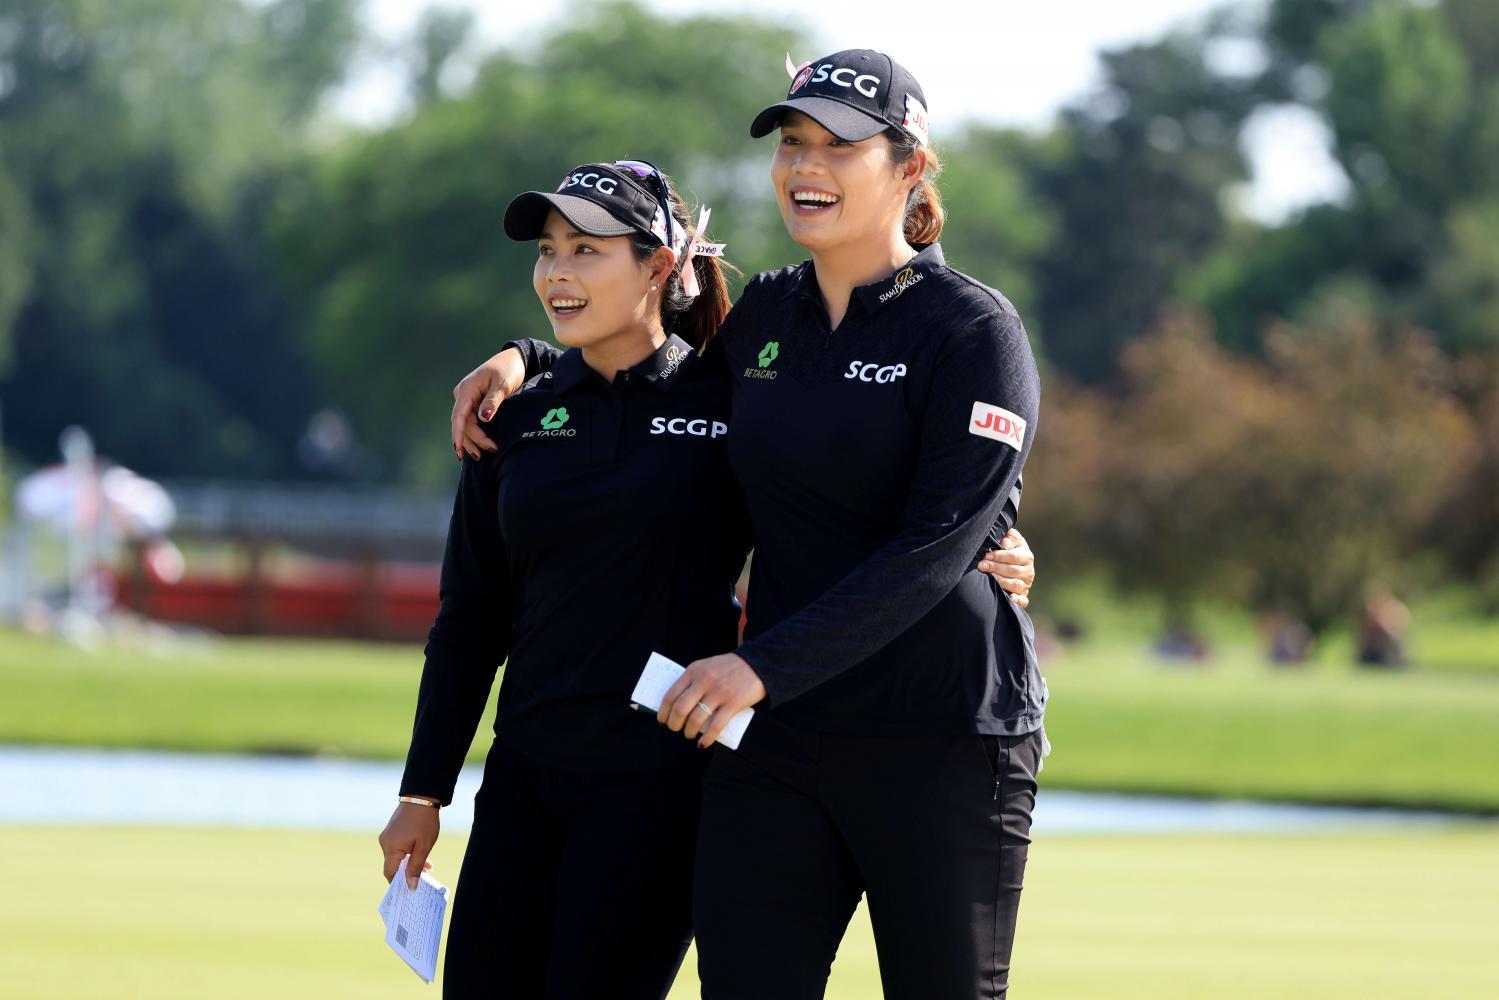 Moriya (left) and Ariya Jutanugarn celebrate after winning the Great Lakes Bay Invitational in Michigan on Sunday.(AFP photo)